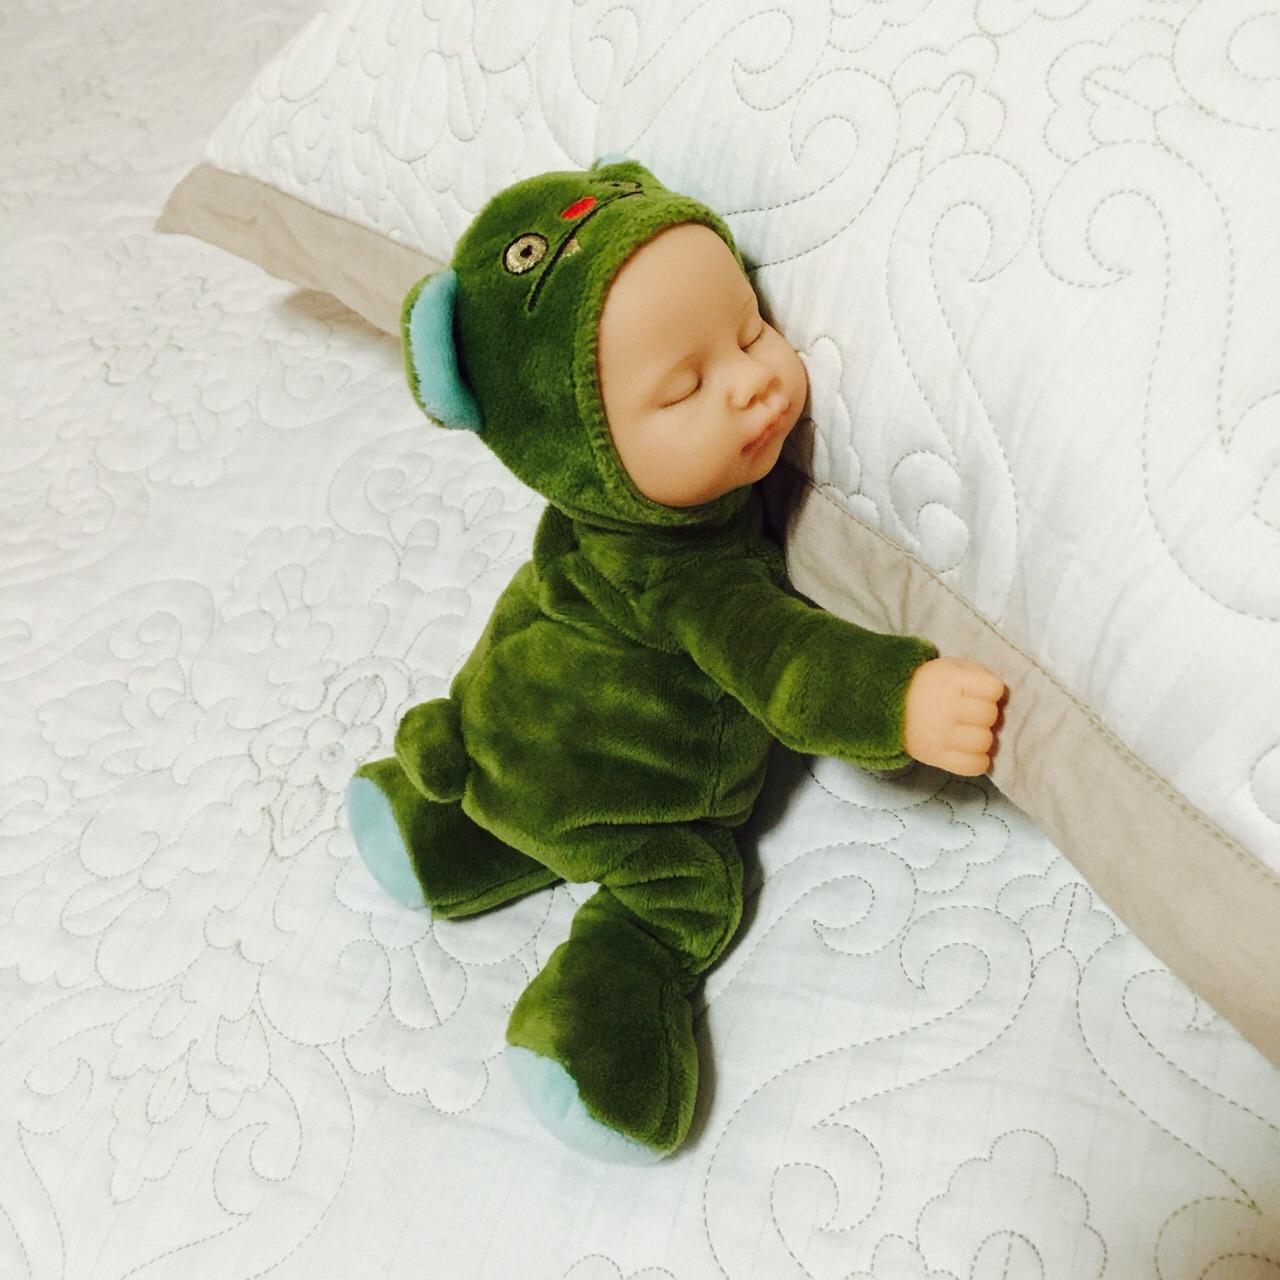 bieber比伯睡眠娃娃